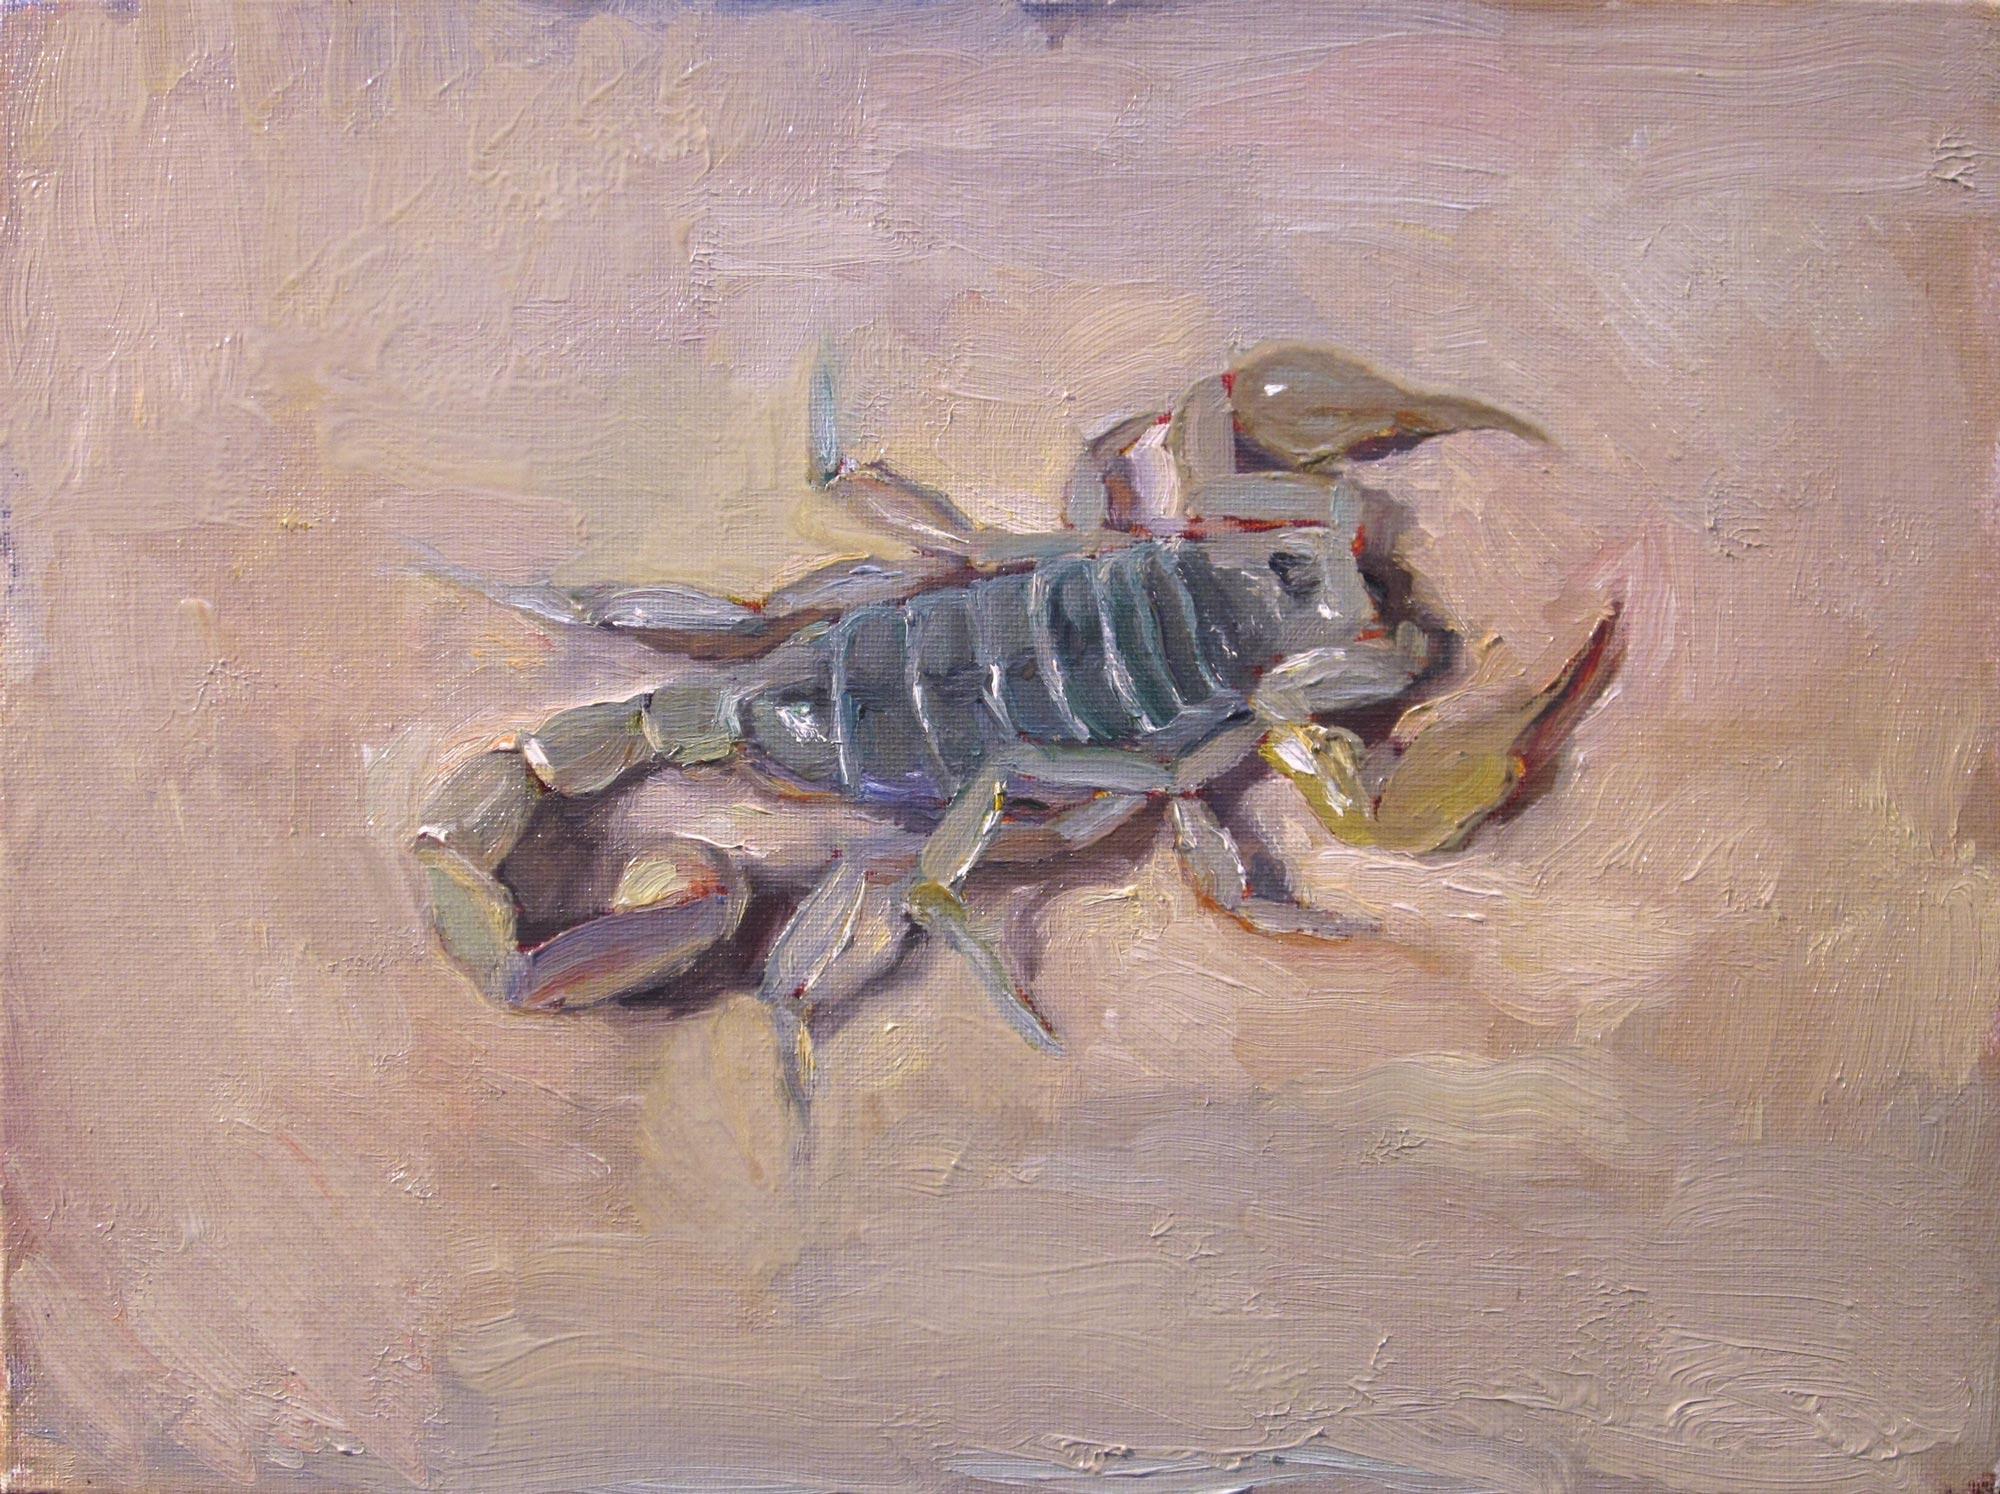 Scorpion, 8 x 10, oil on canvas, 2012